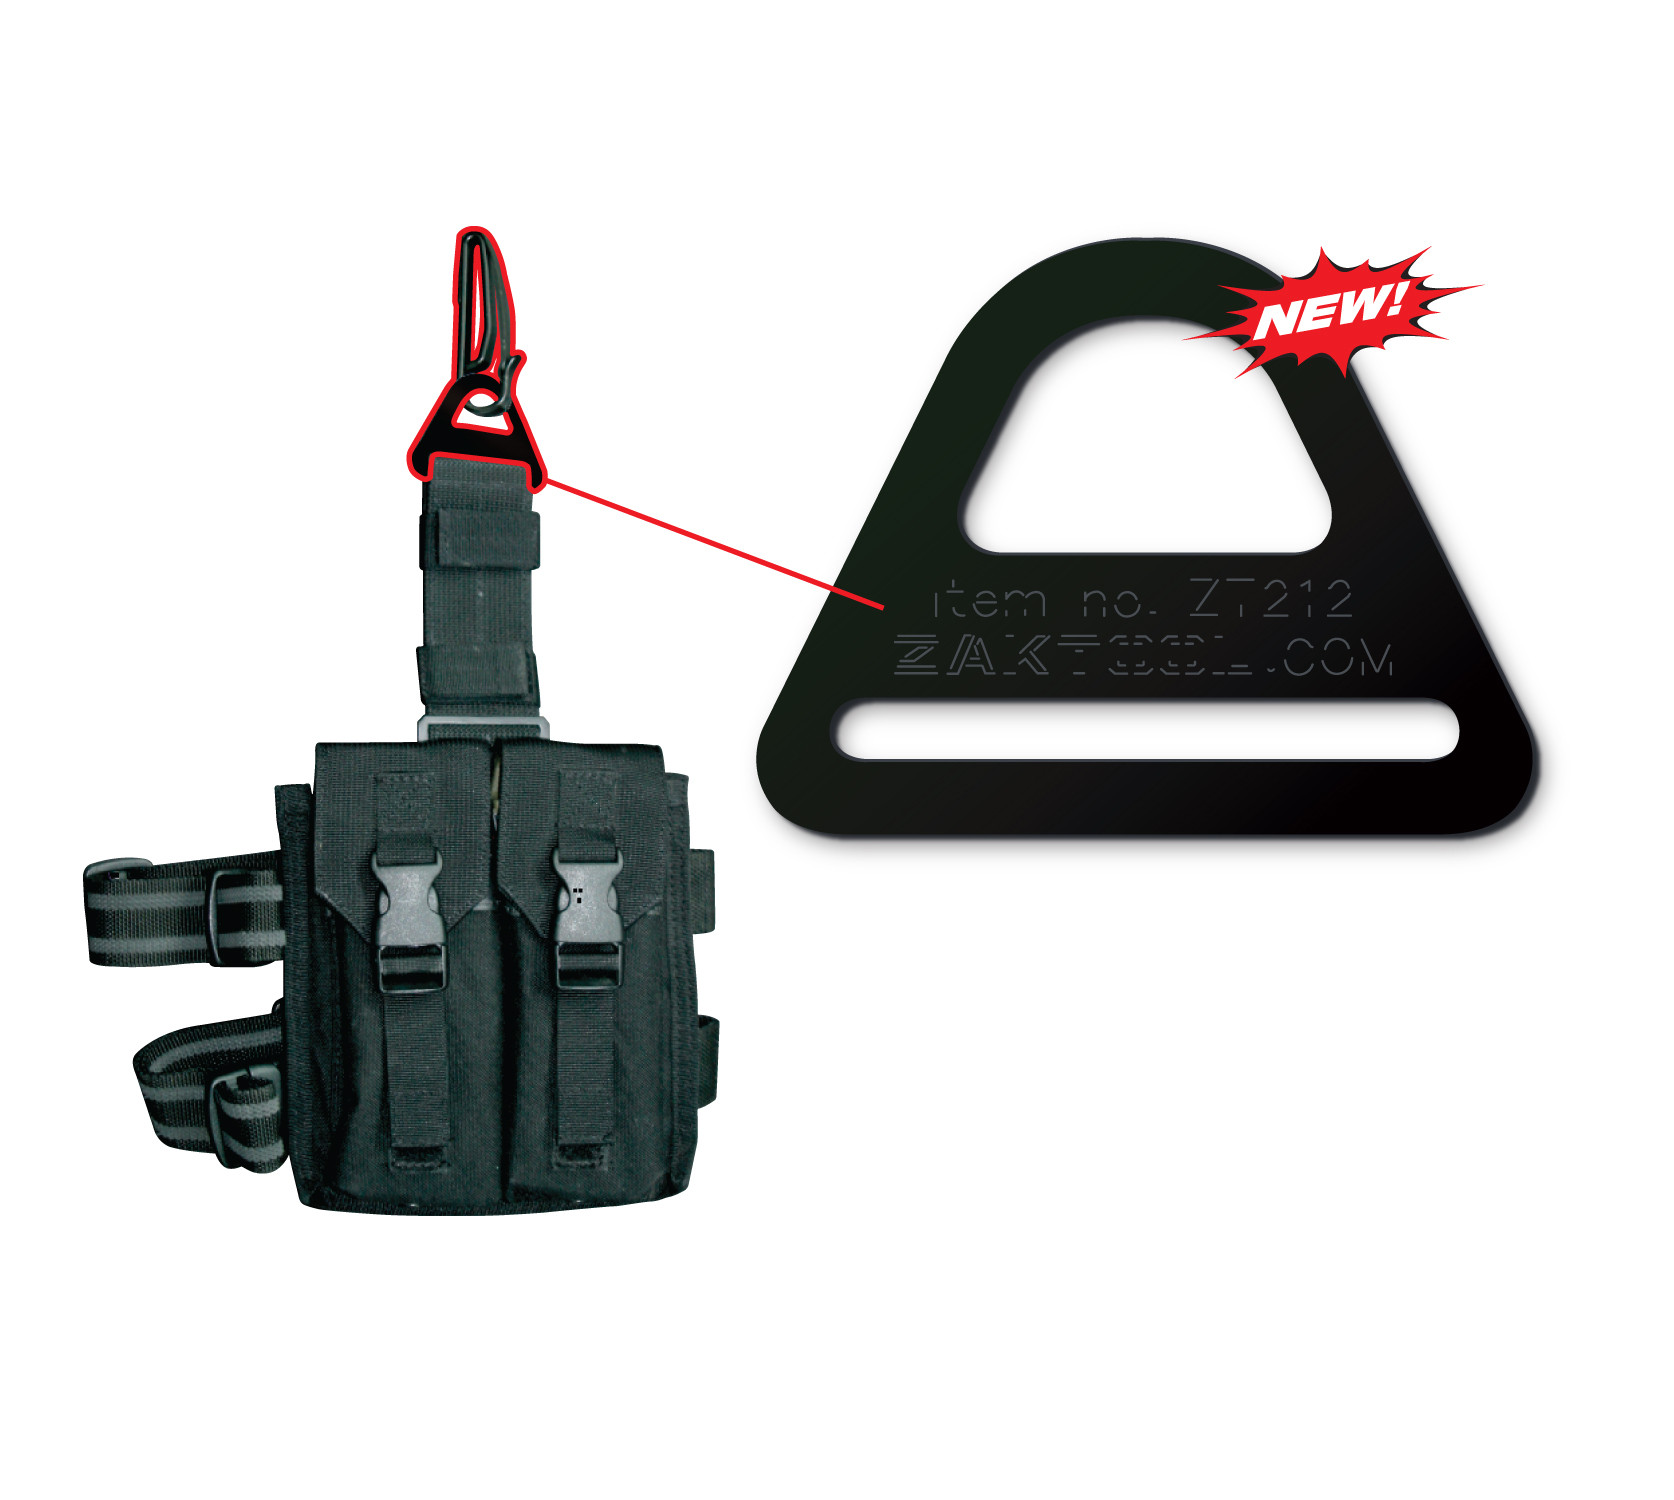 ZAK Tactical Belt Clip System -ZAK Tool